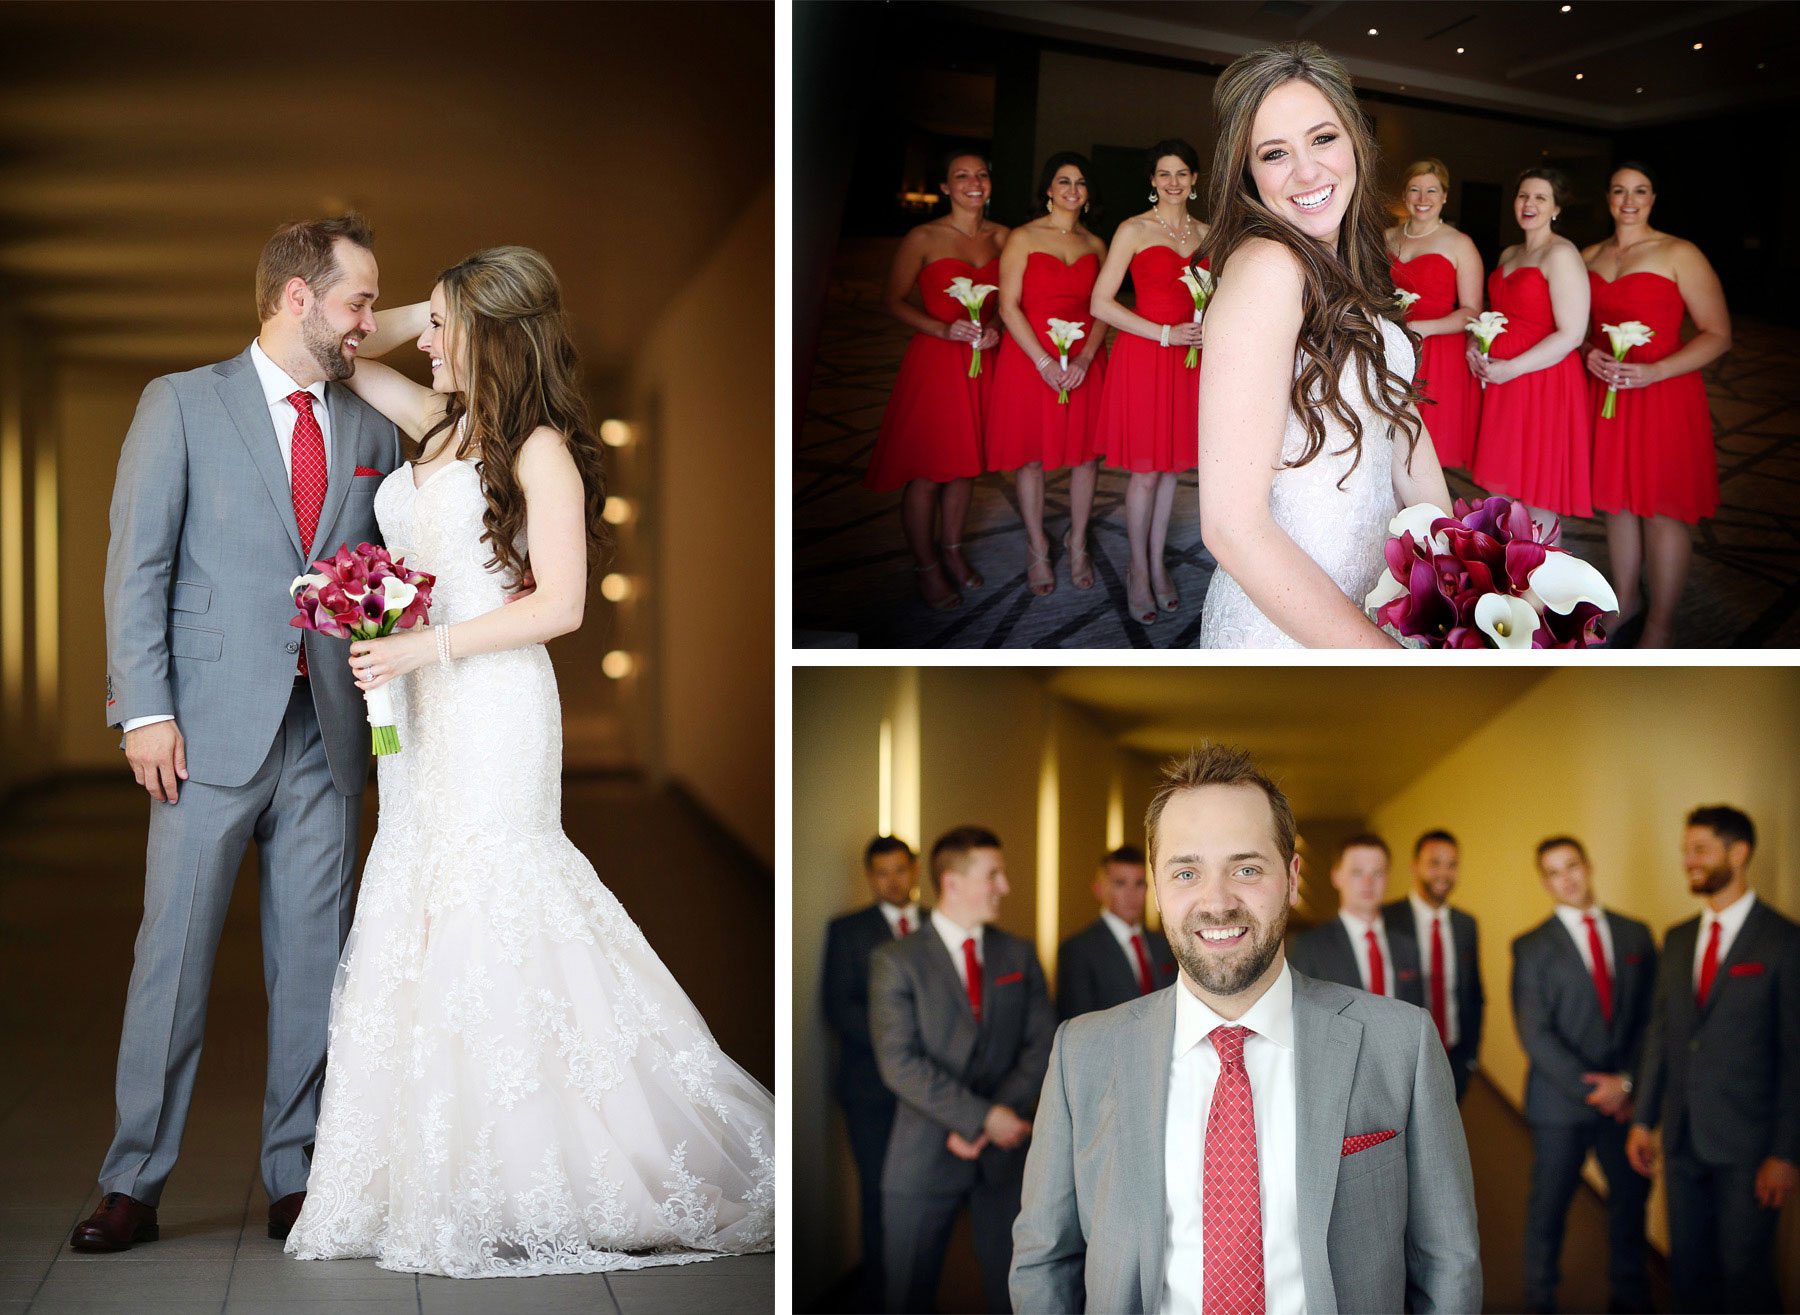 10-Minneapolis-Minnesota-Wedding-Photographer-by-Andrew-Vick-Photography-Summer-Edina-Westin-Hotel-Dress-Flowers-Wedding-Party-Bridesmaids-Groomsmen-Bride-Groom-Natalie-and-Andrew.jpg